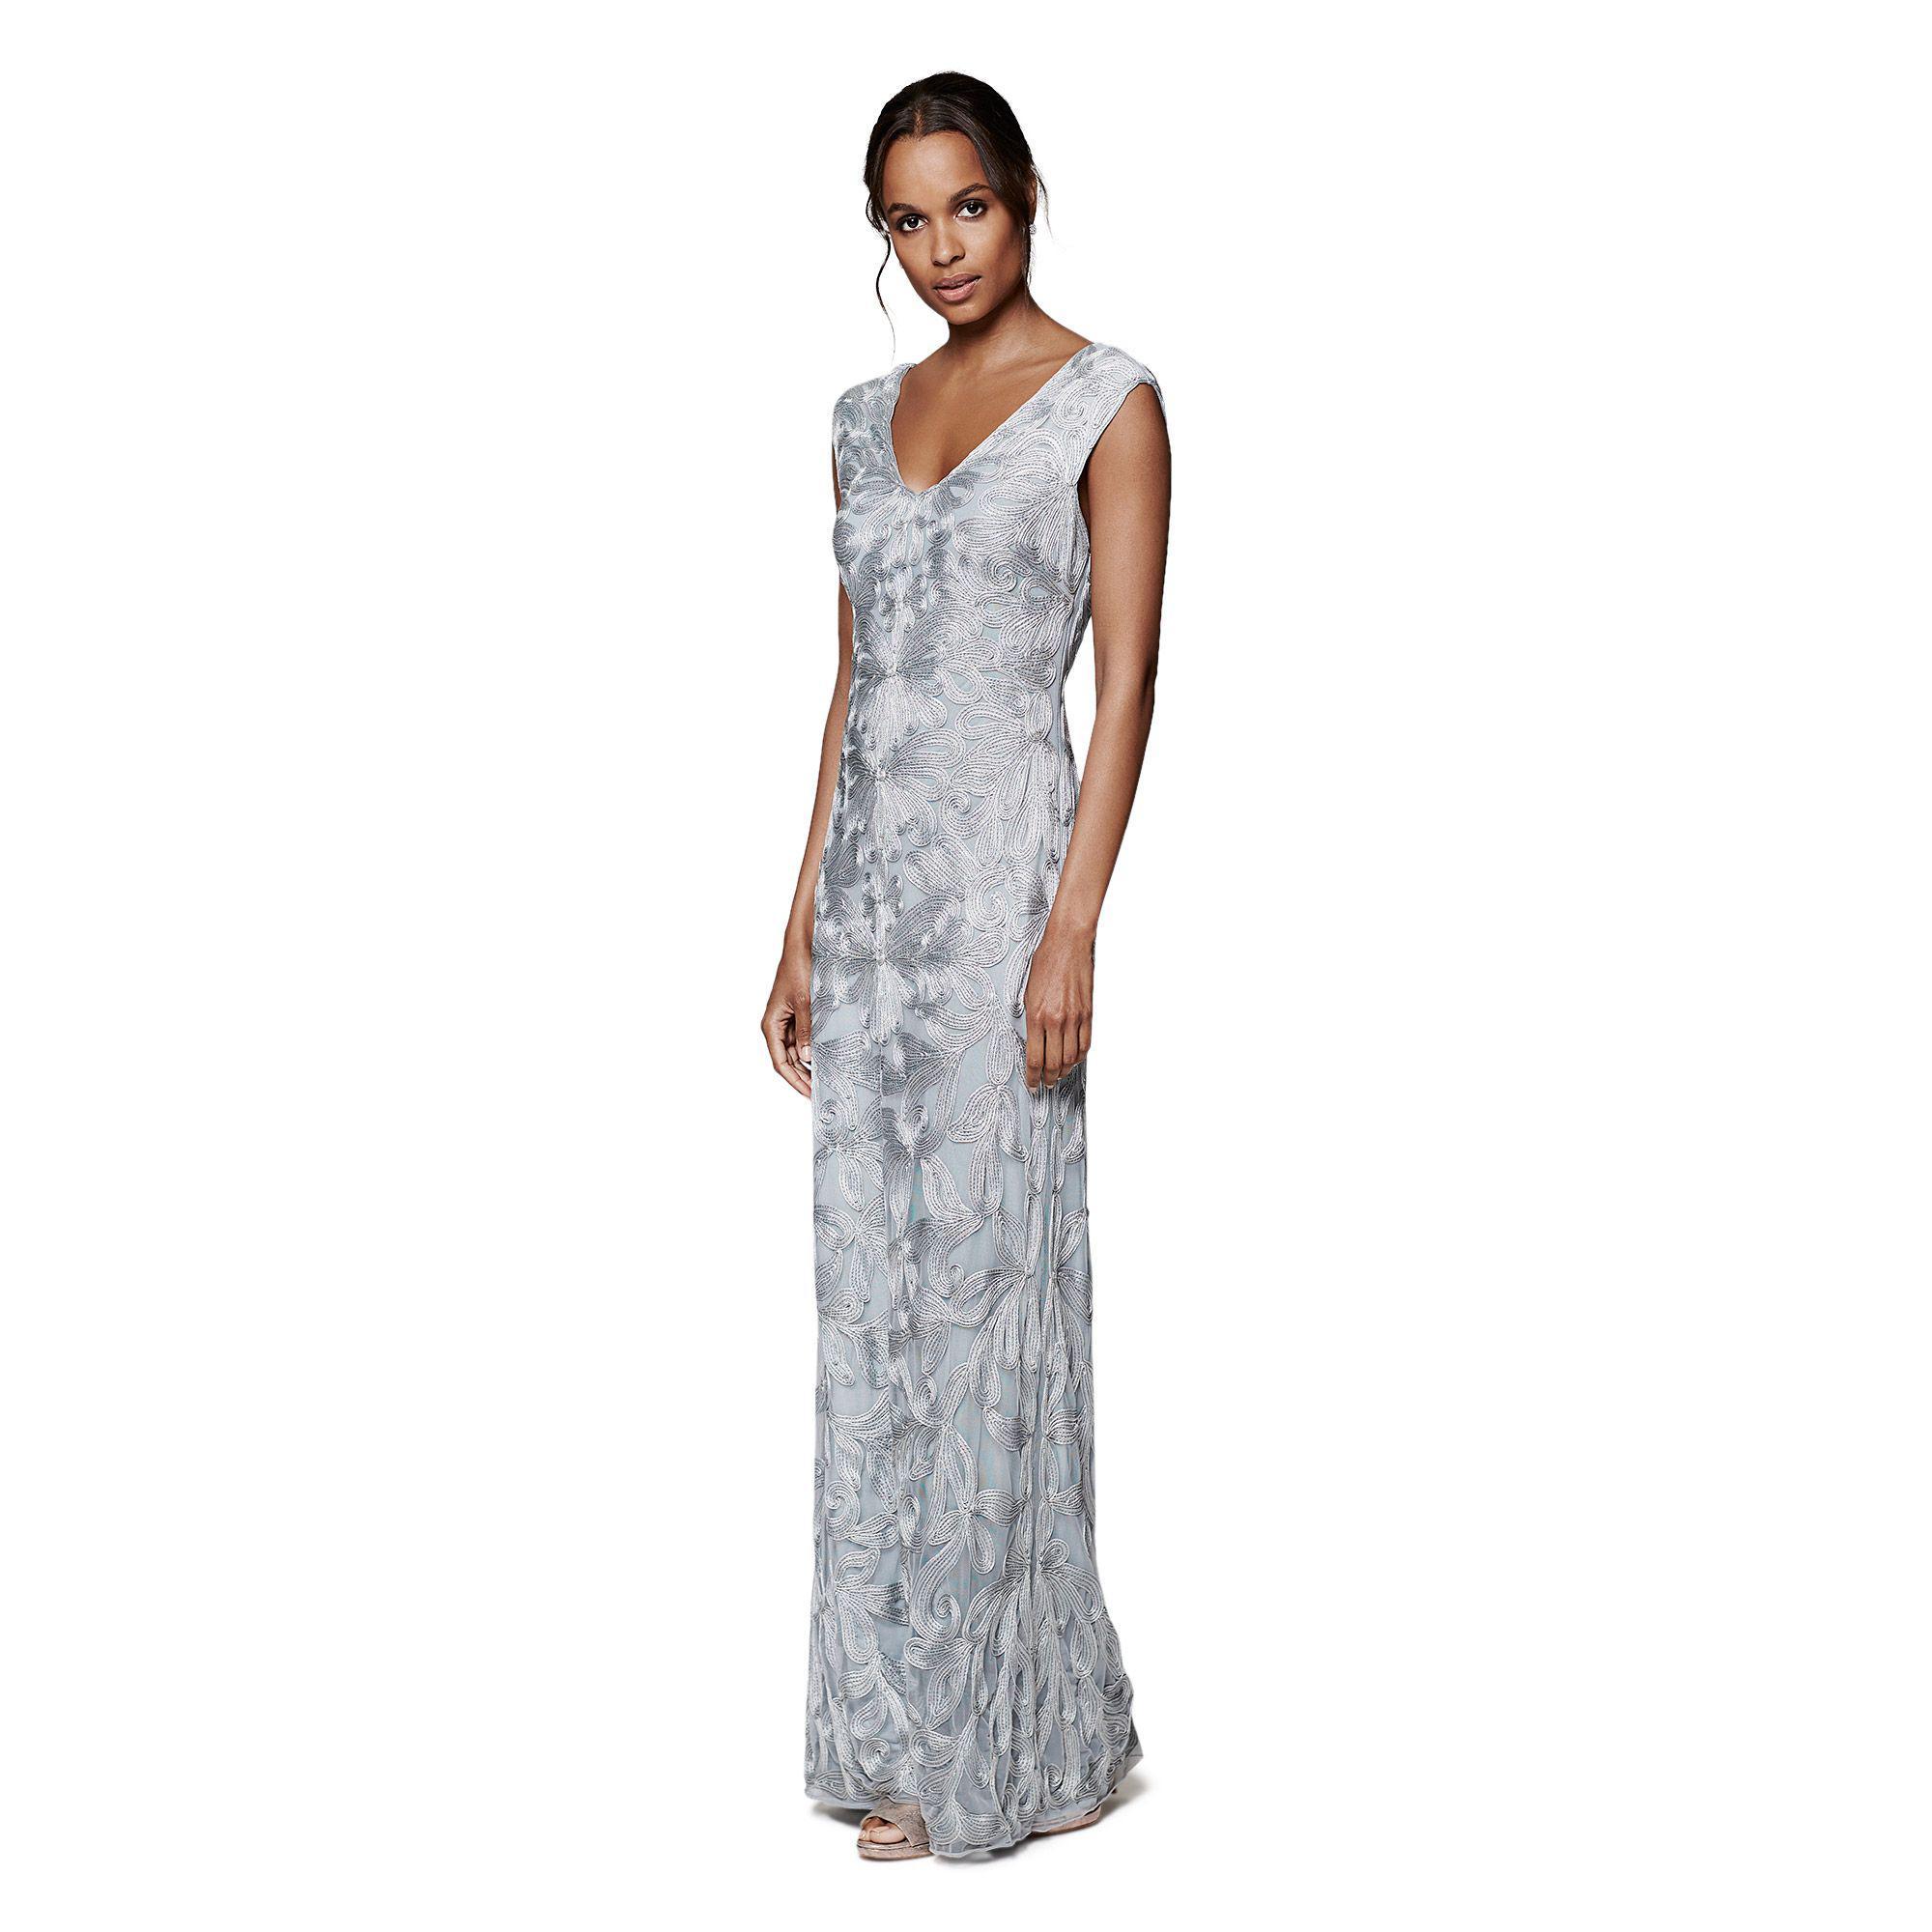 Phase Eight Serenna Tapework Dress in Blue - Lyst